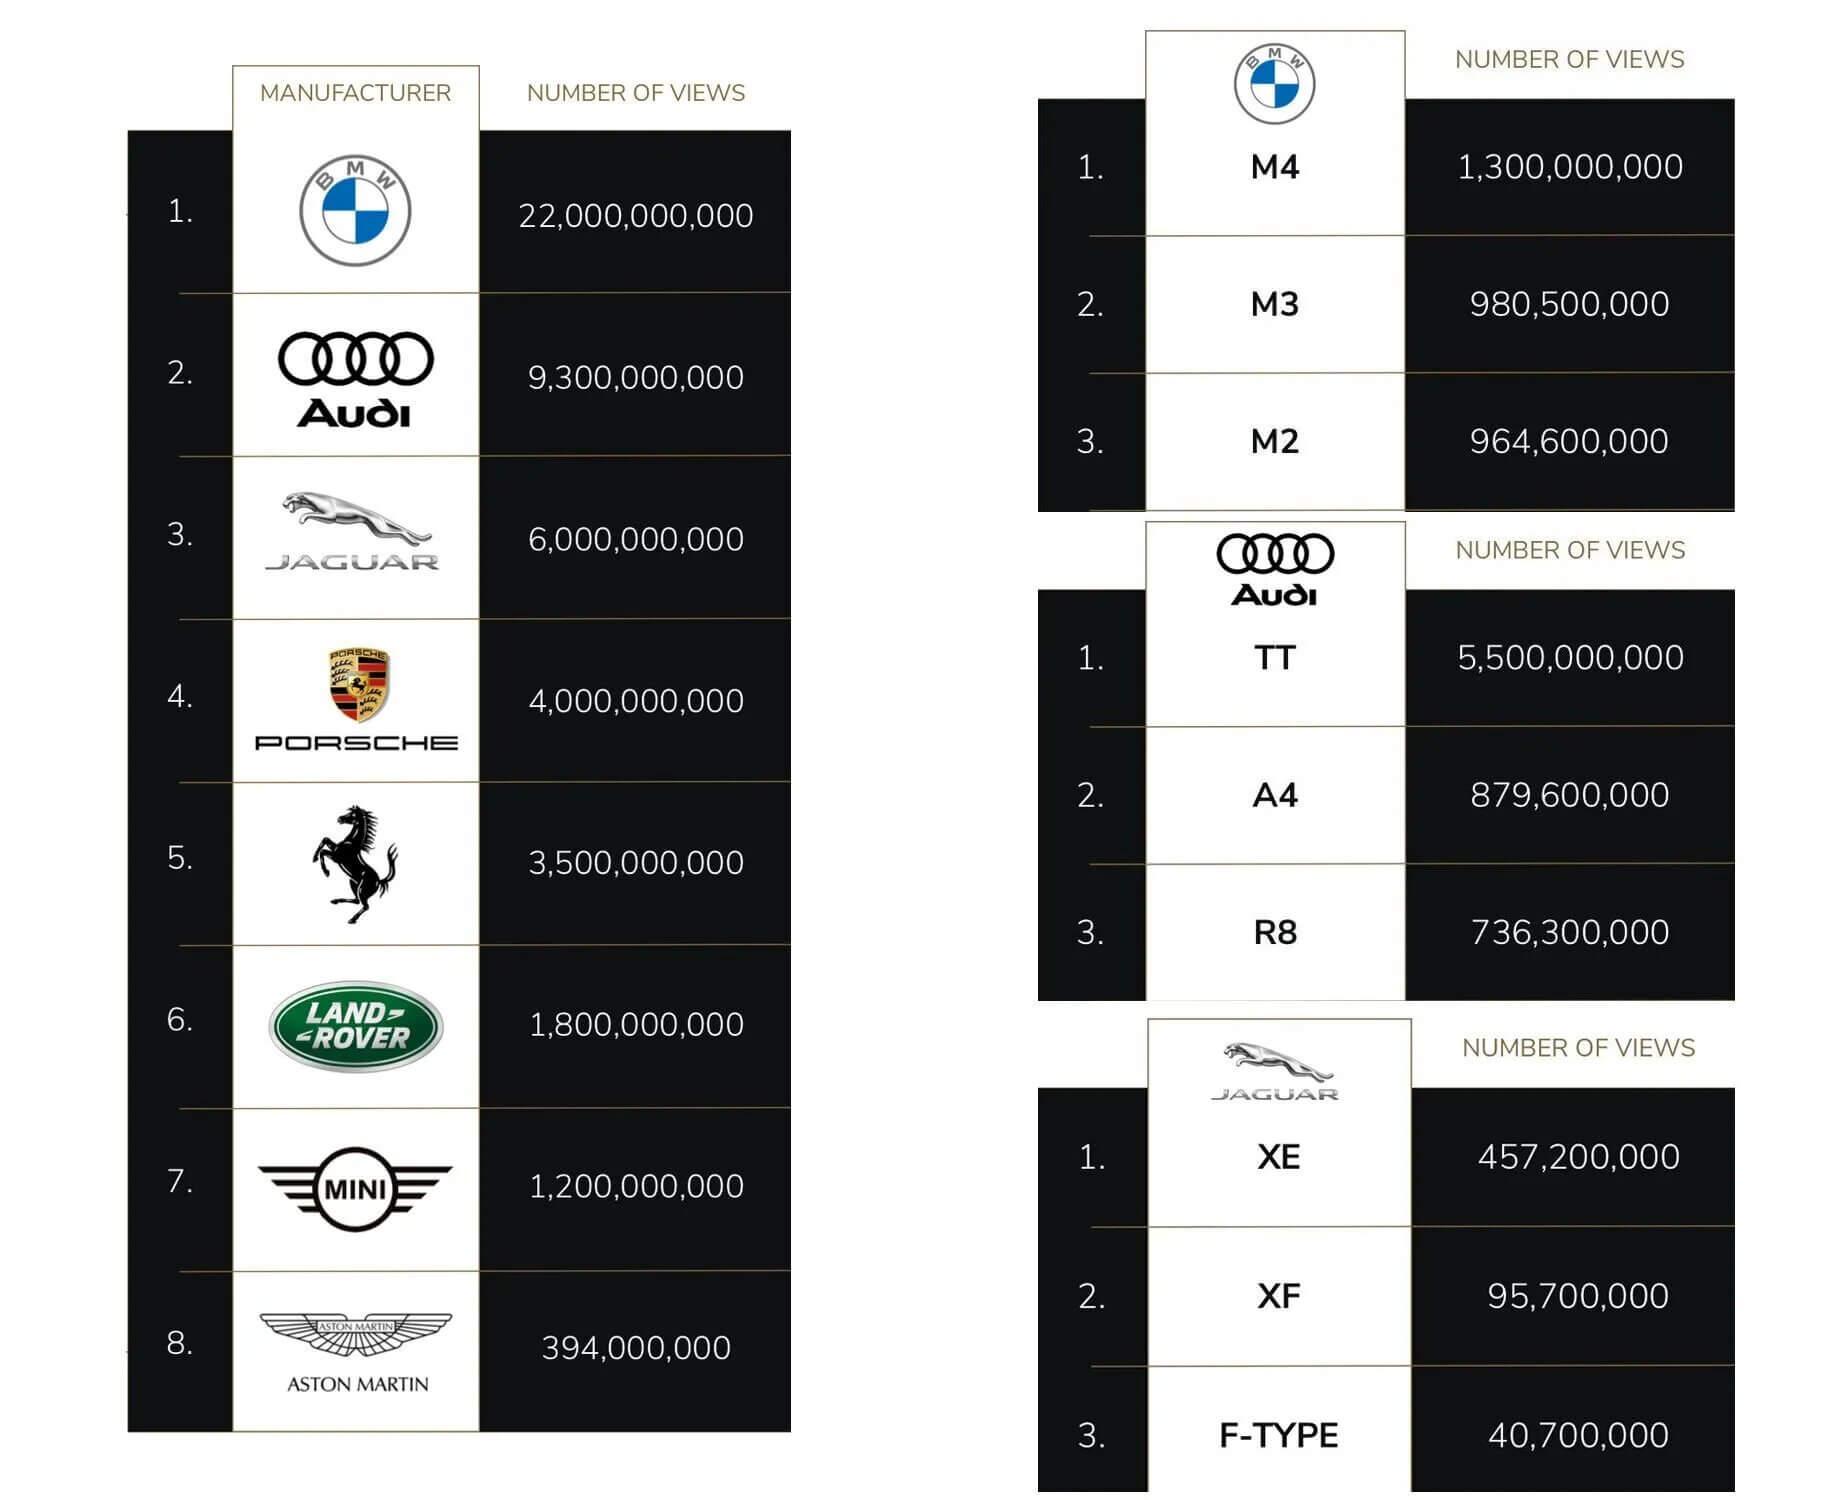 tiktok ranking manufacturer